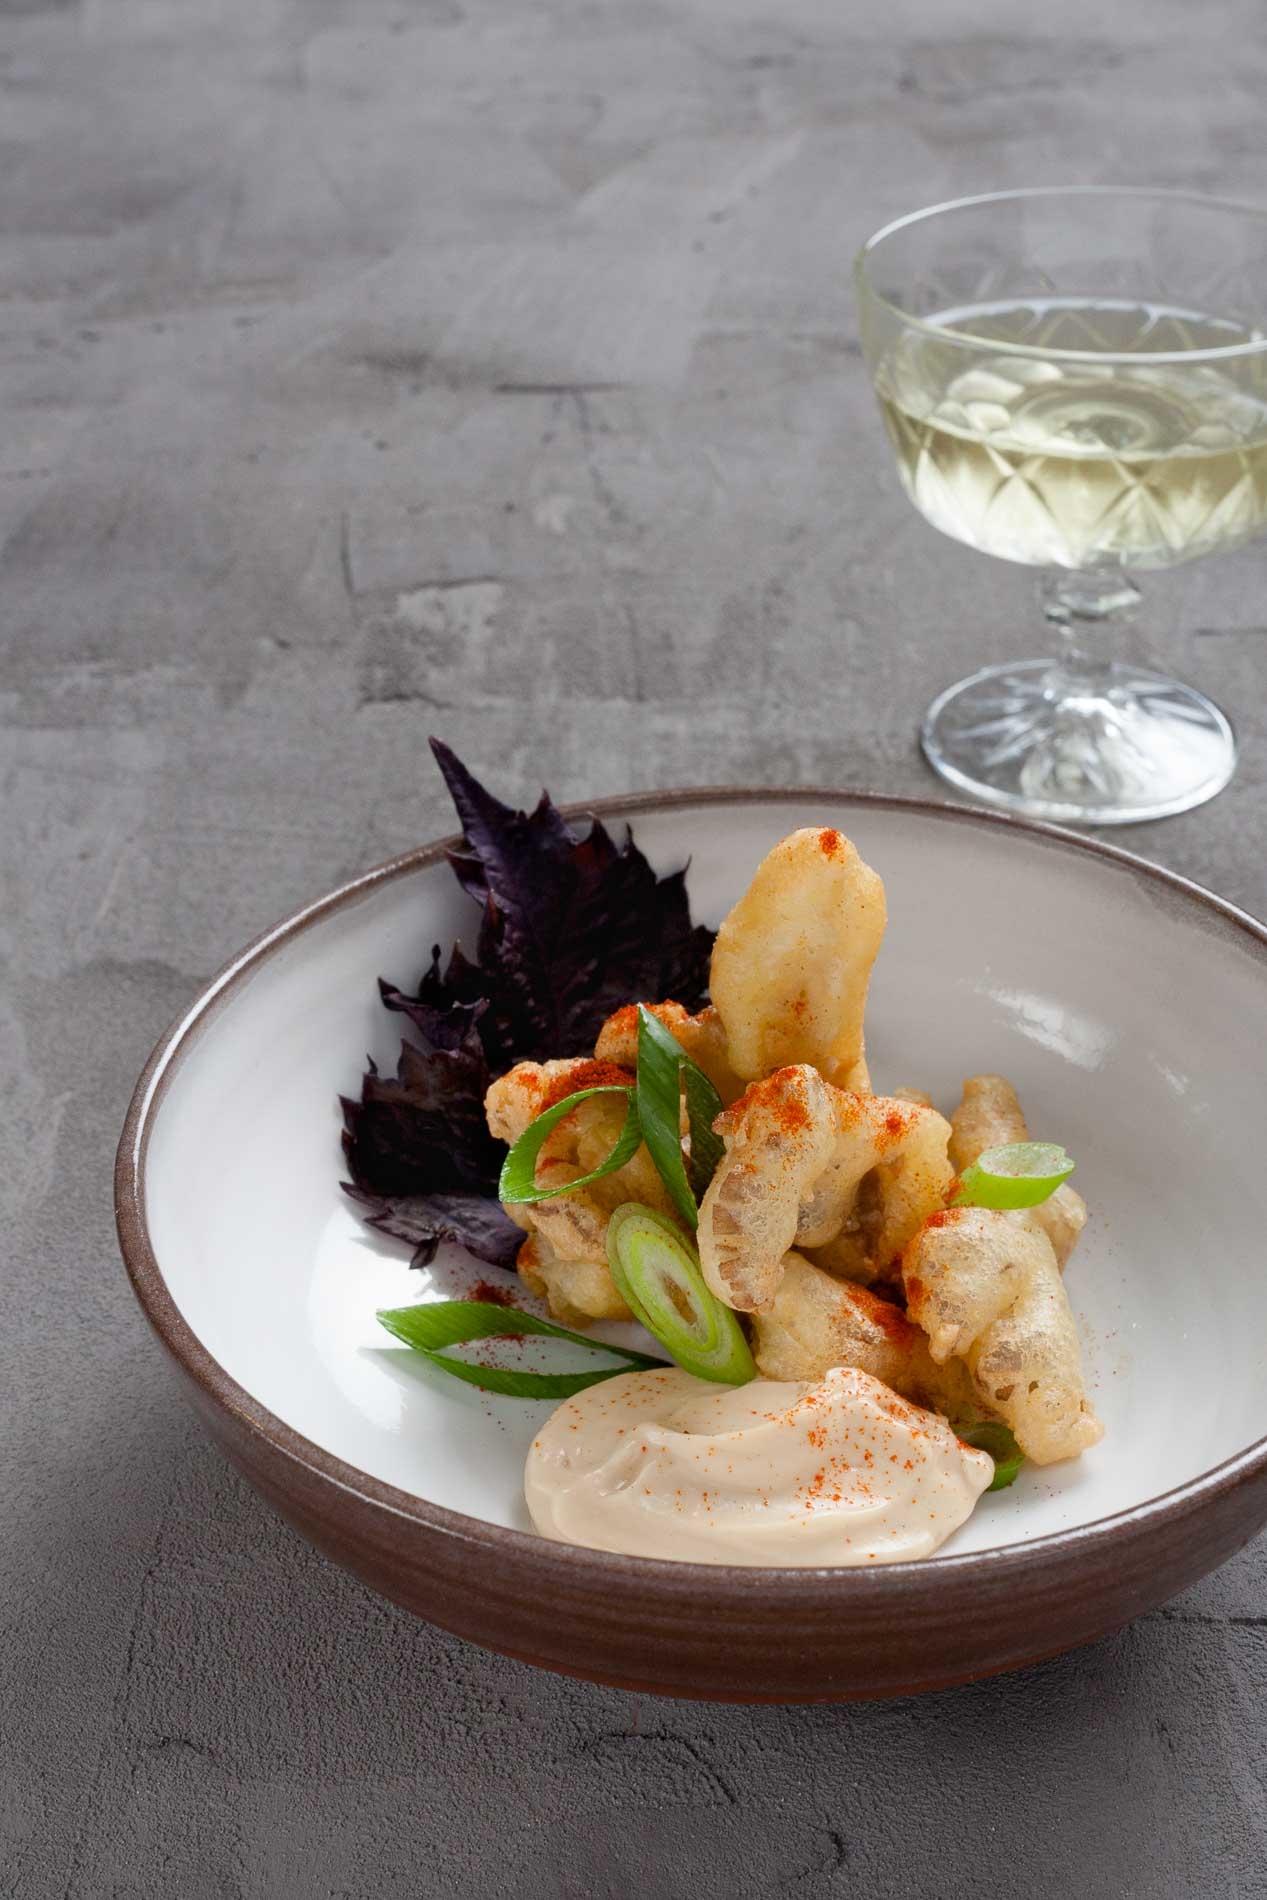 plant-based starter gourmet dish in a restaurant